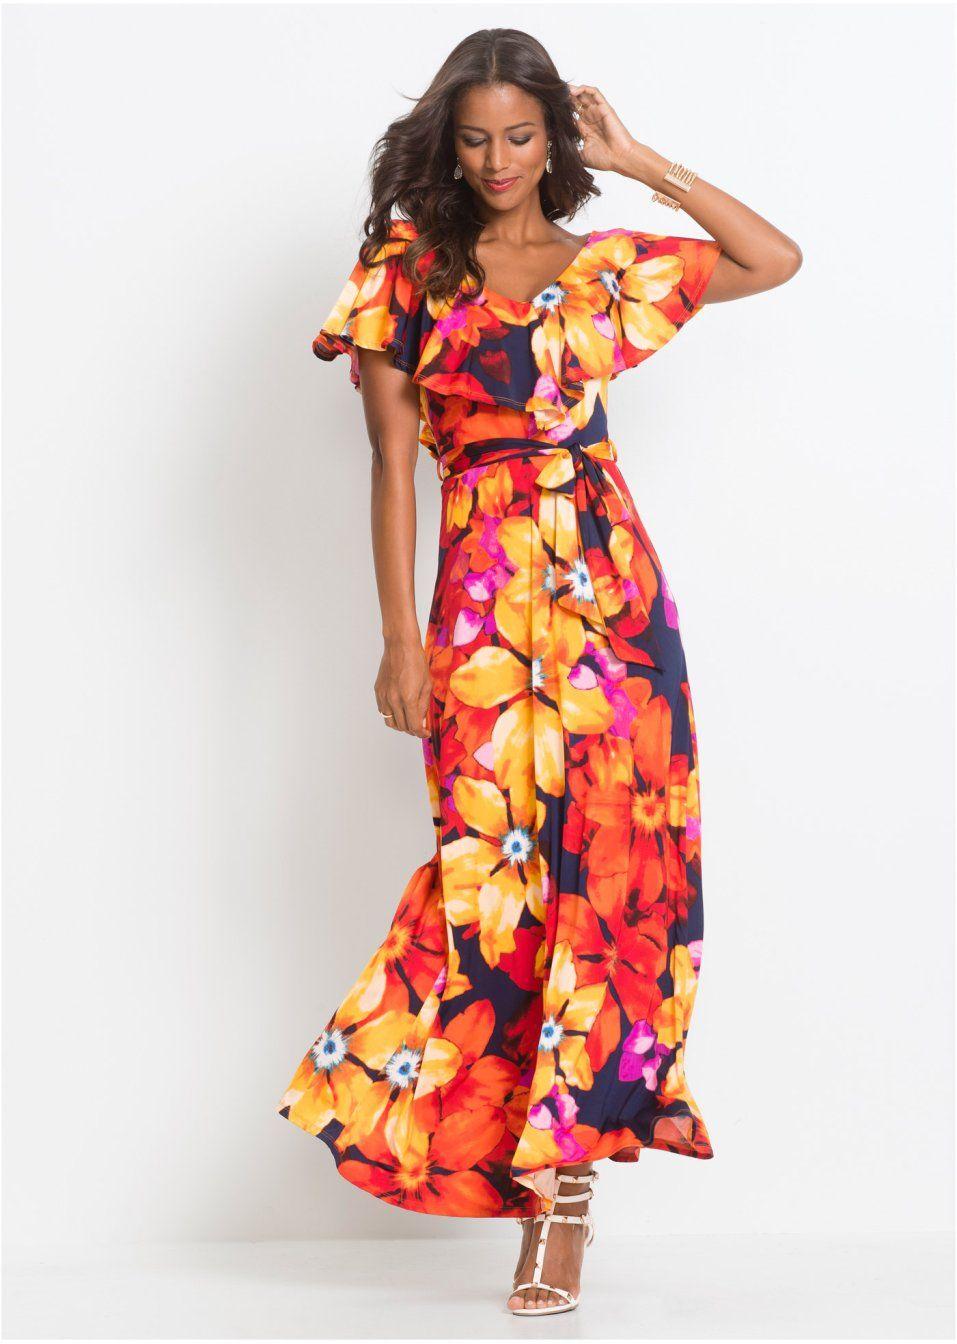 8e5faa616443 Jurk   dresses voor div. doeleinden - Fashion, Summer dresses en ...